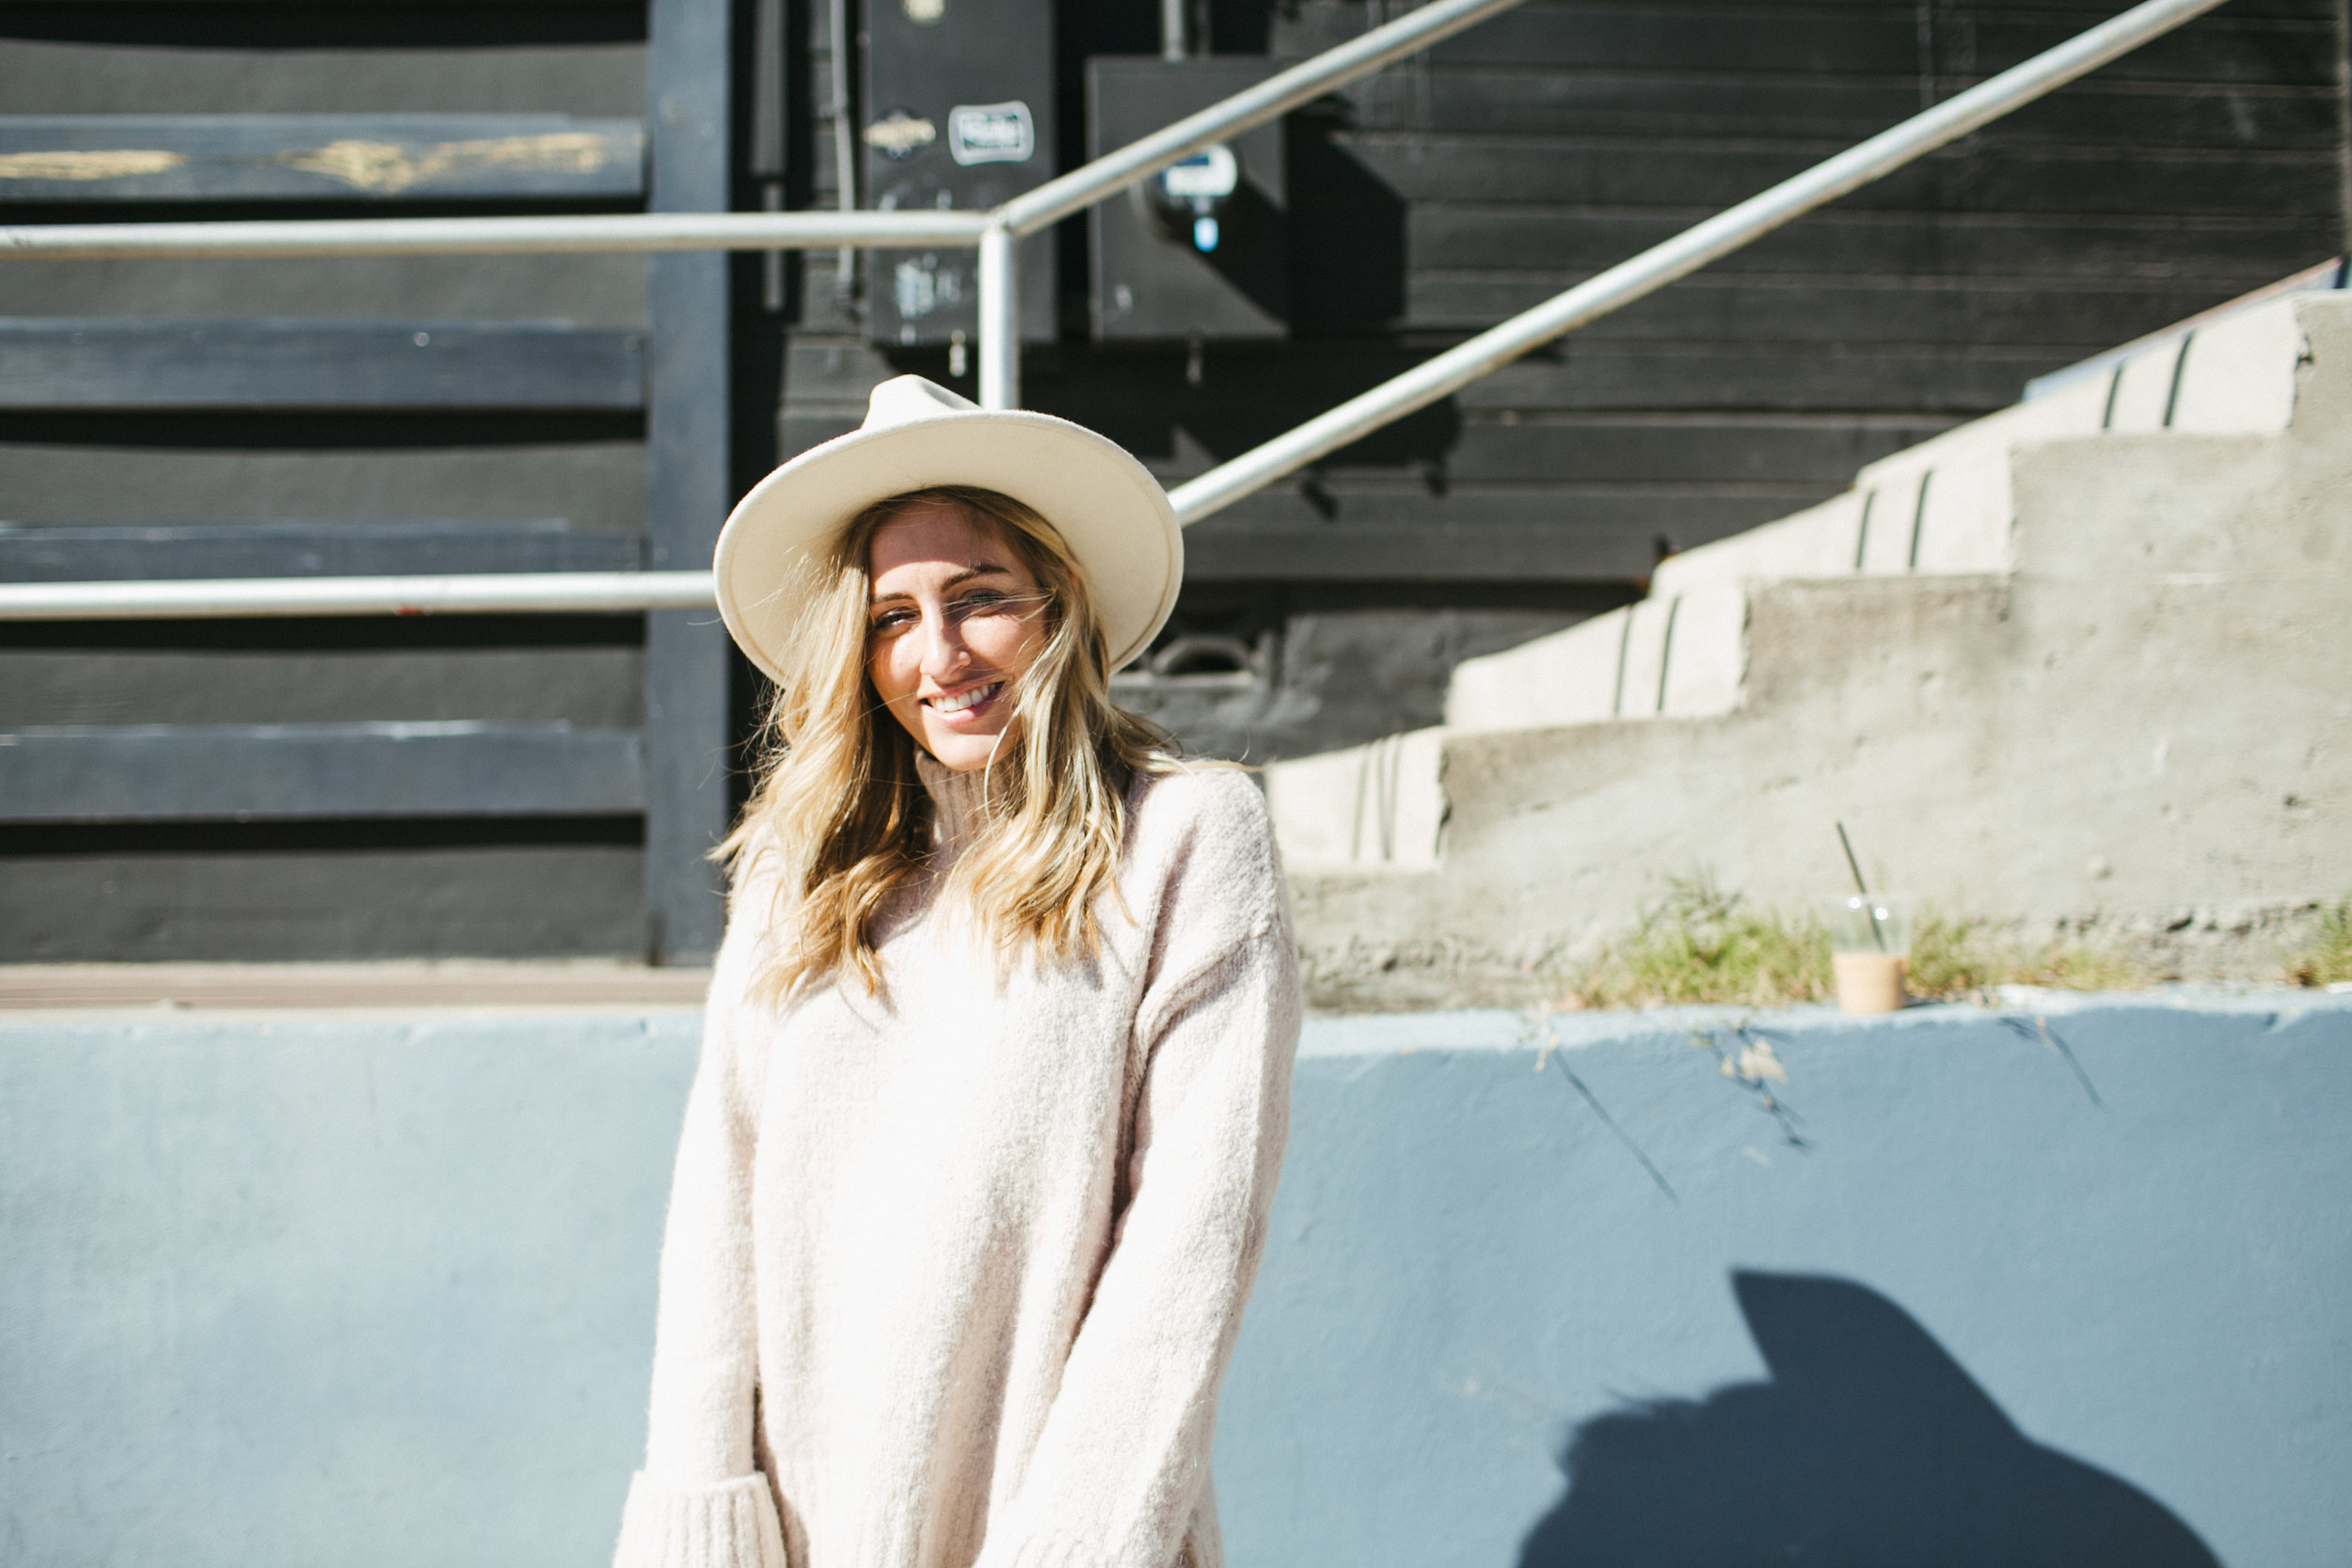 Paige-Newton-Lifestyle-Fashion-Blogger-Influencer-Photography-047.jpg